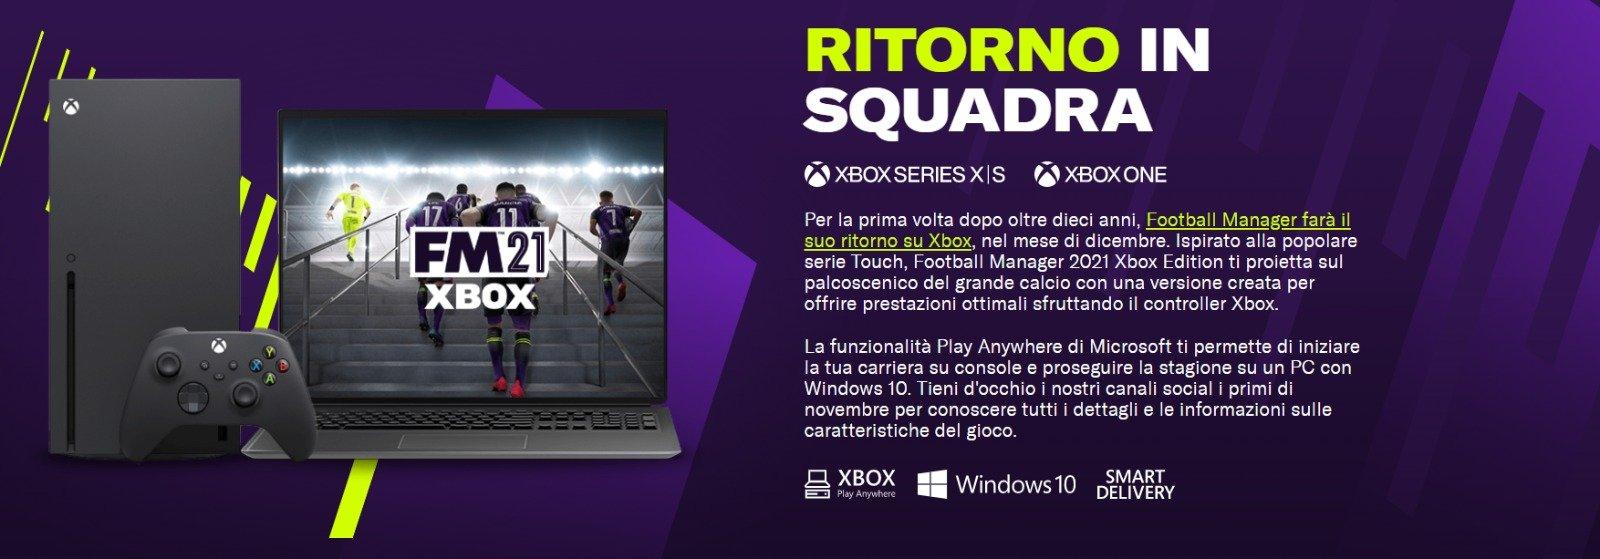 Football Manager 2021 arriva su Xbox